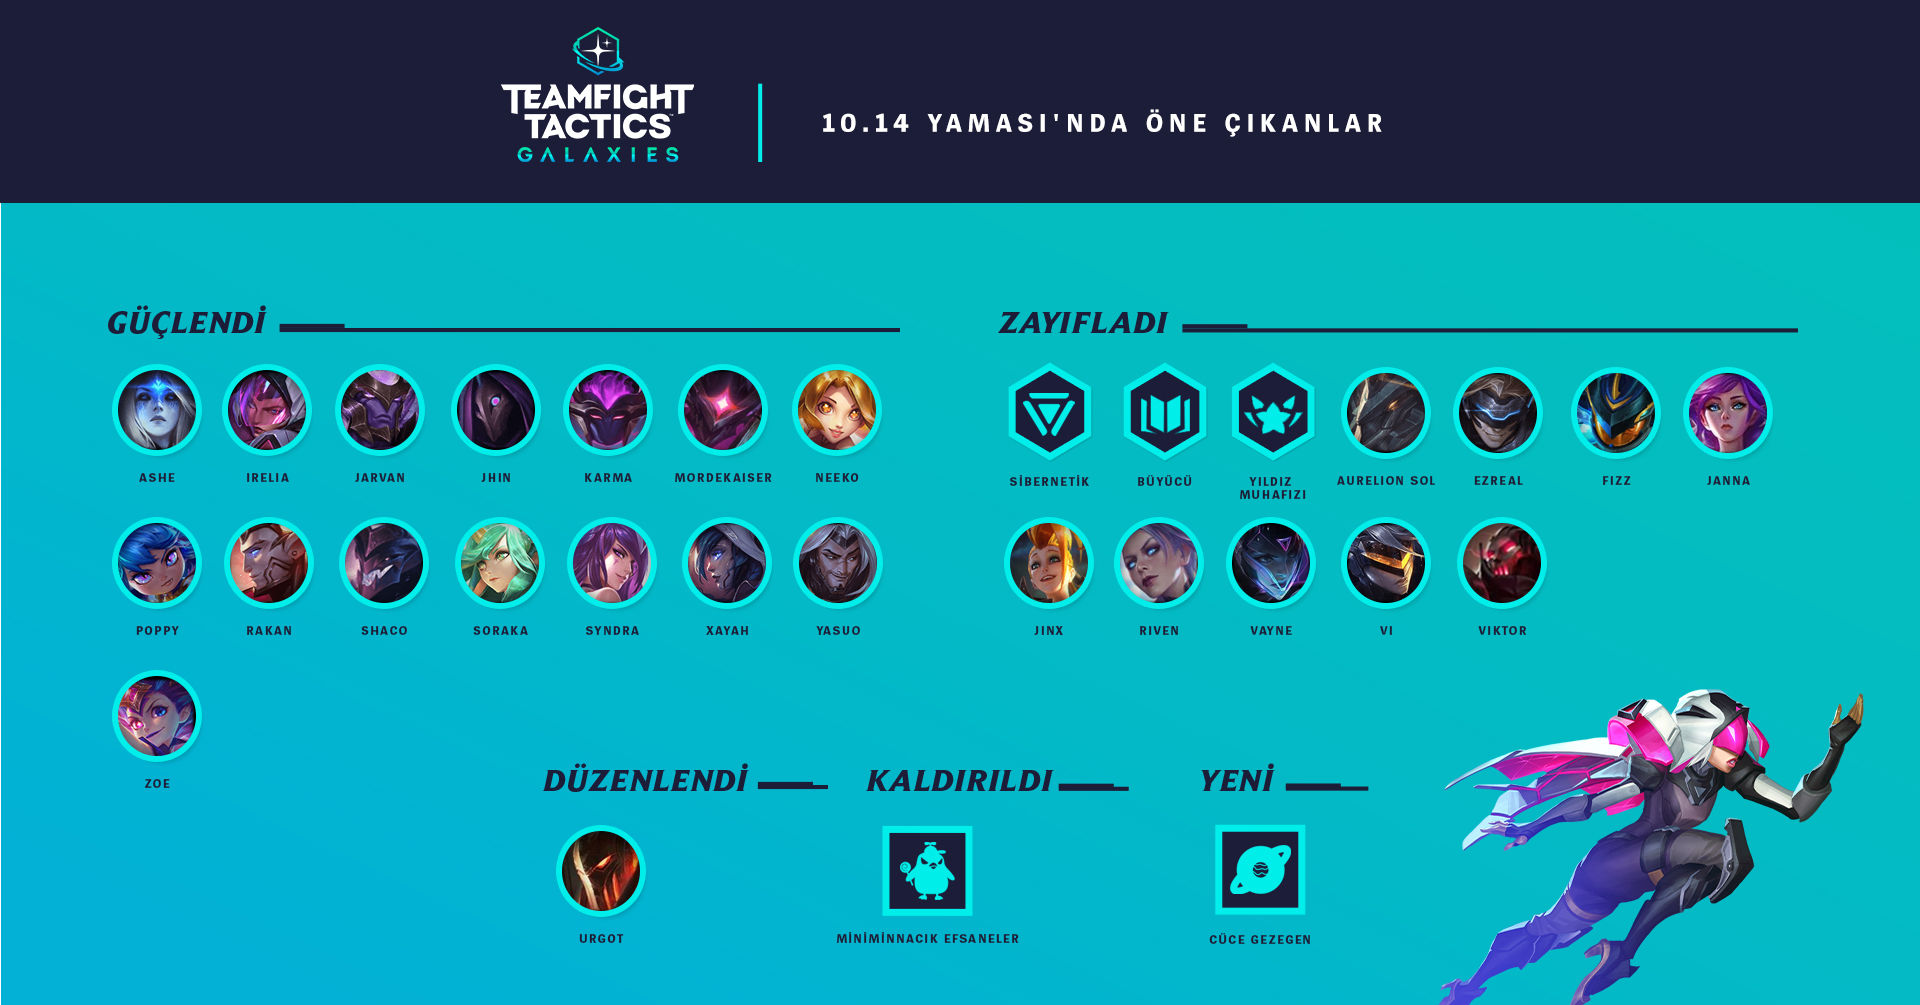 Teamfight Tactics 10.14 yama notları yayınlandı